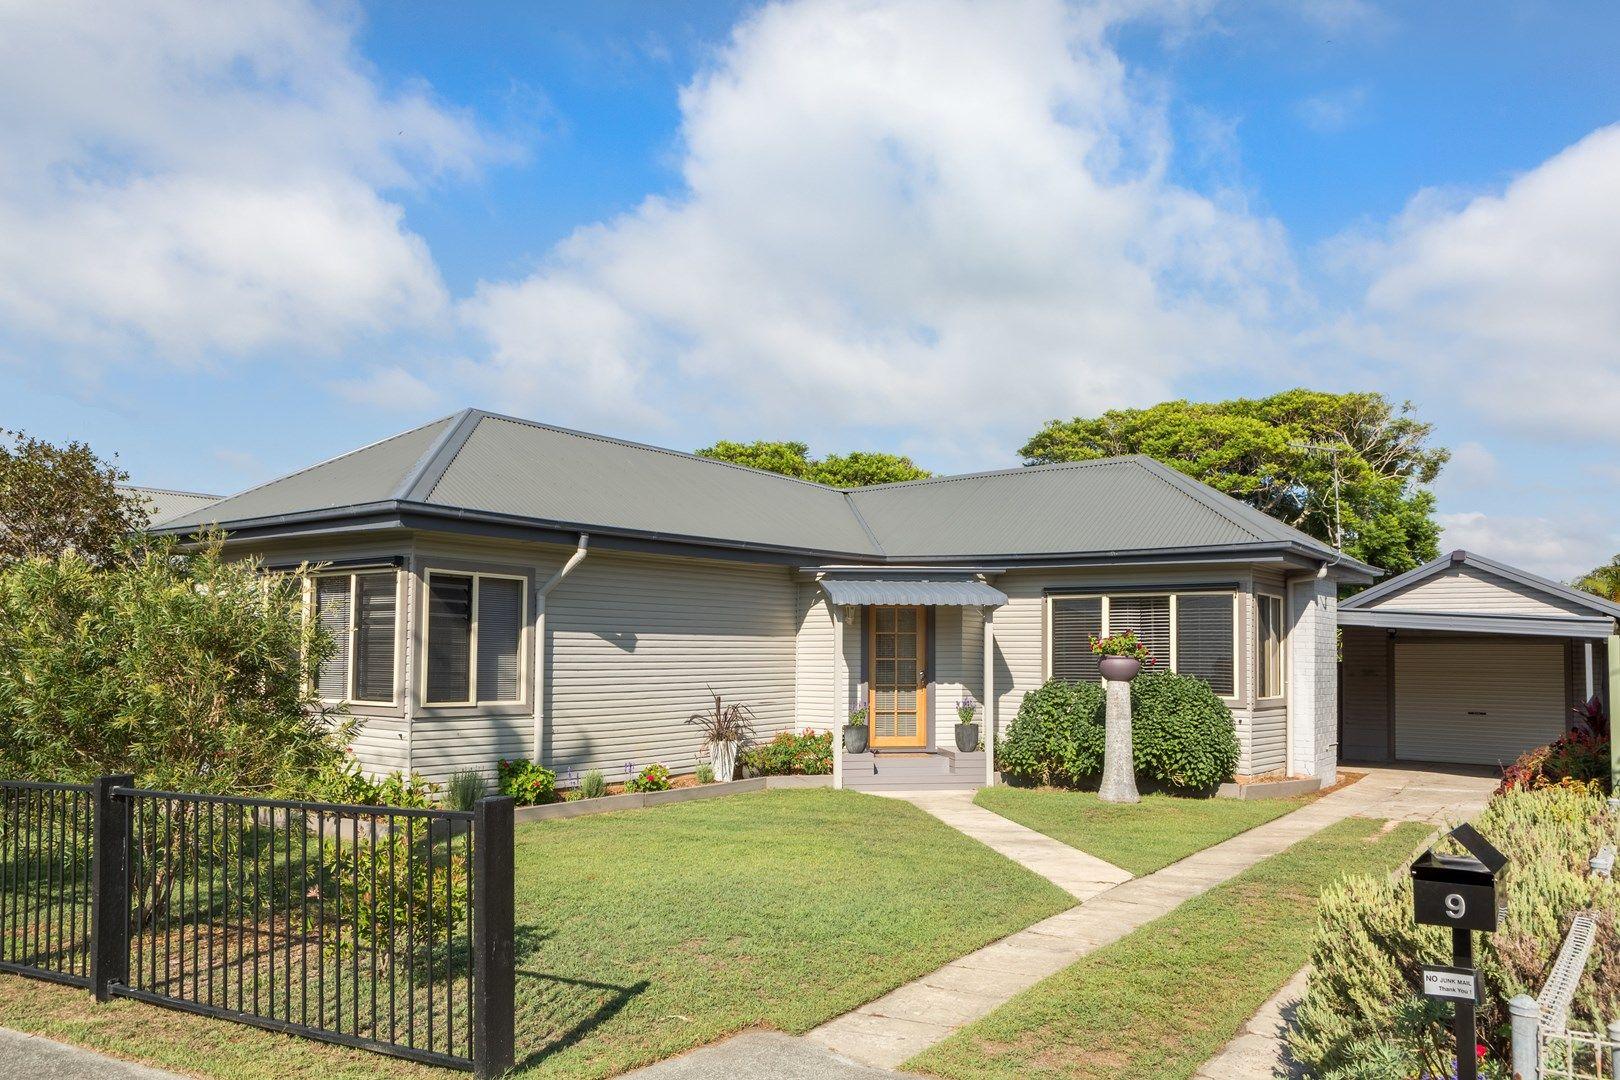 9 Breckenridge Street, Forster NSW 2428, Image 0